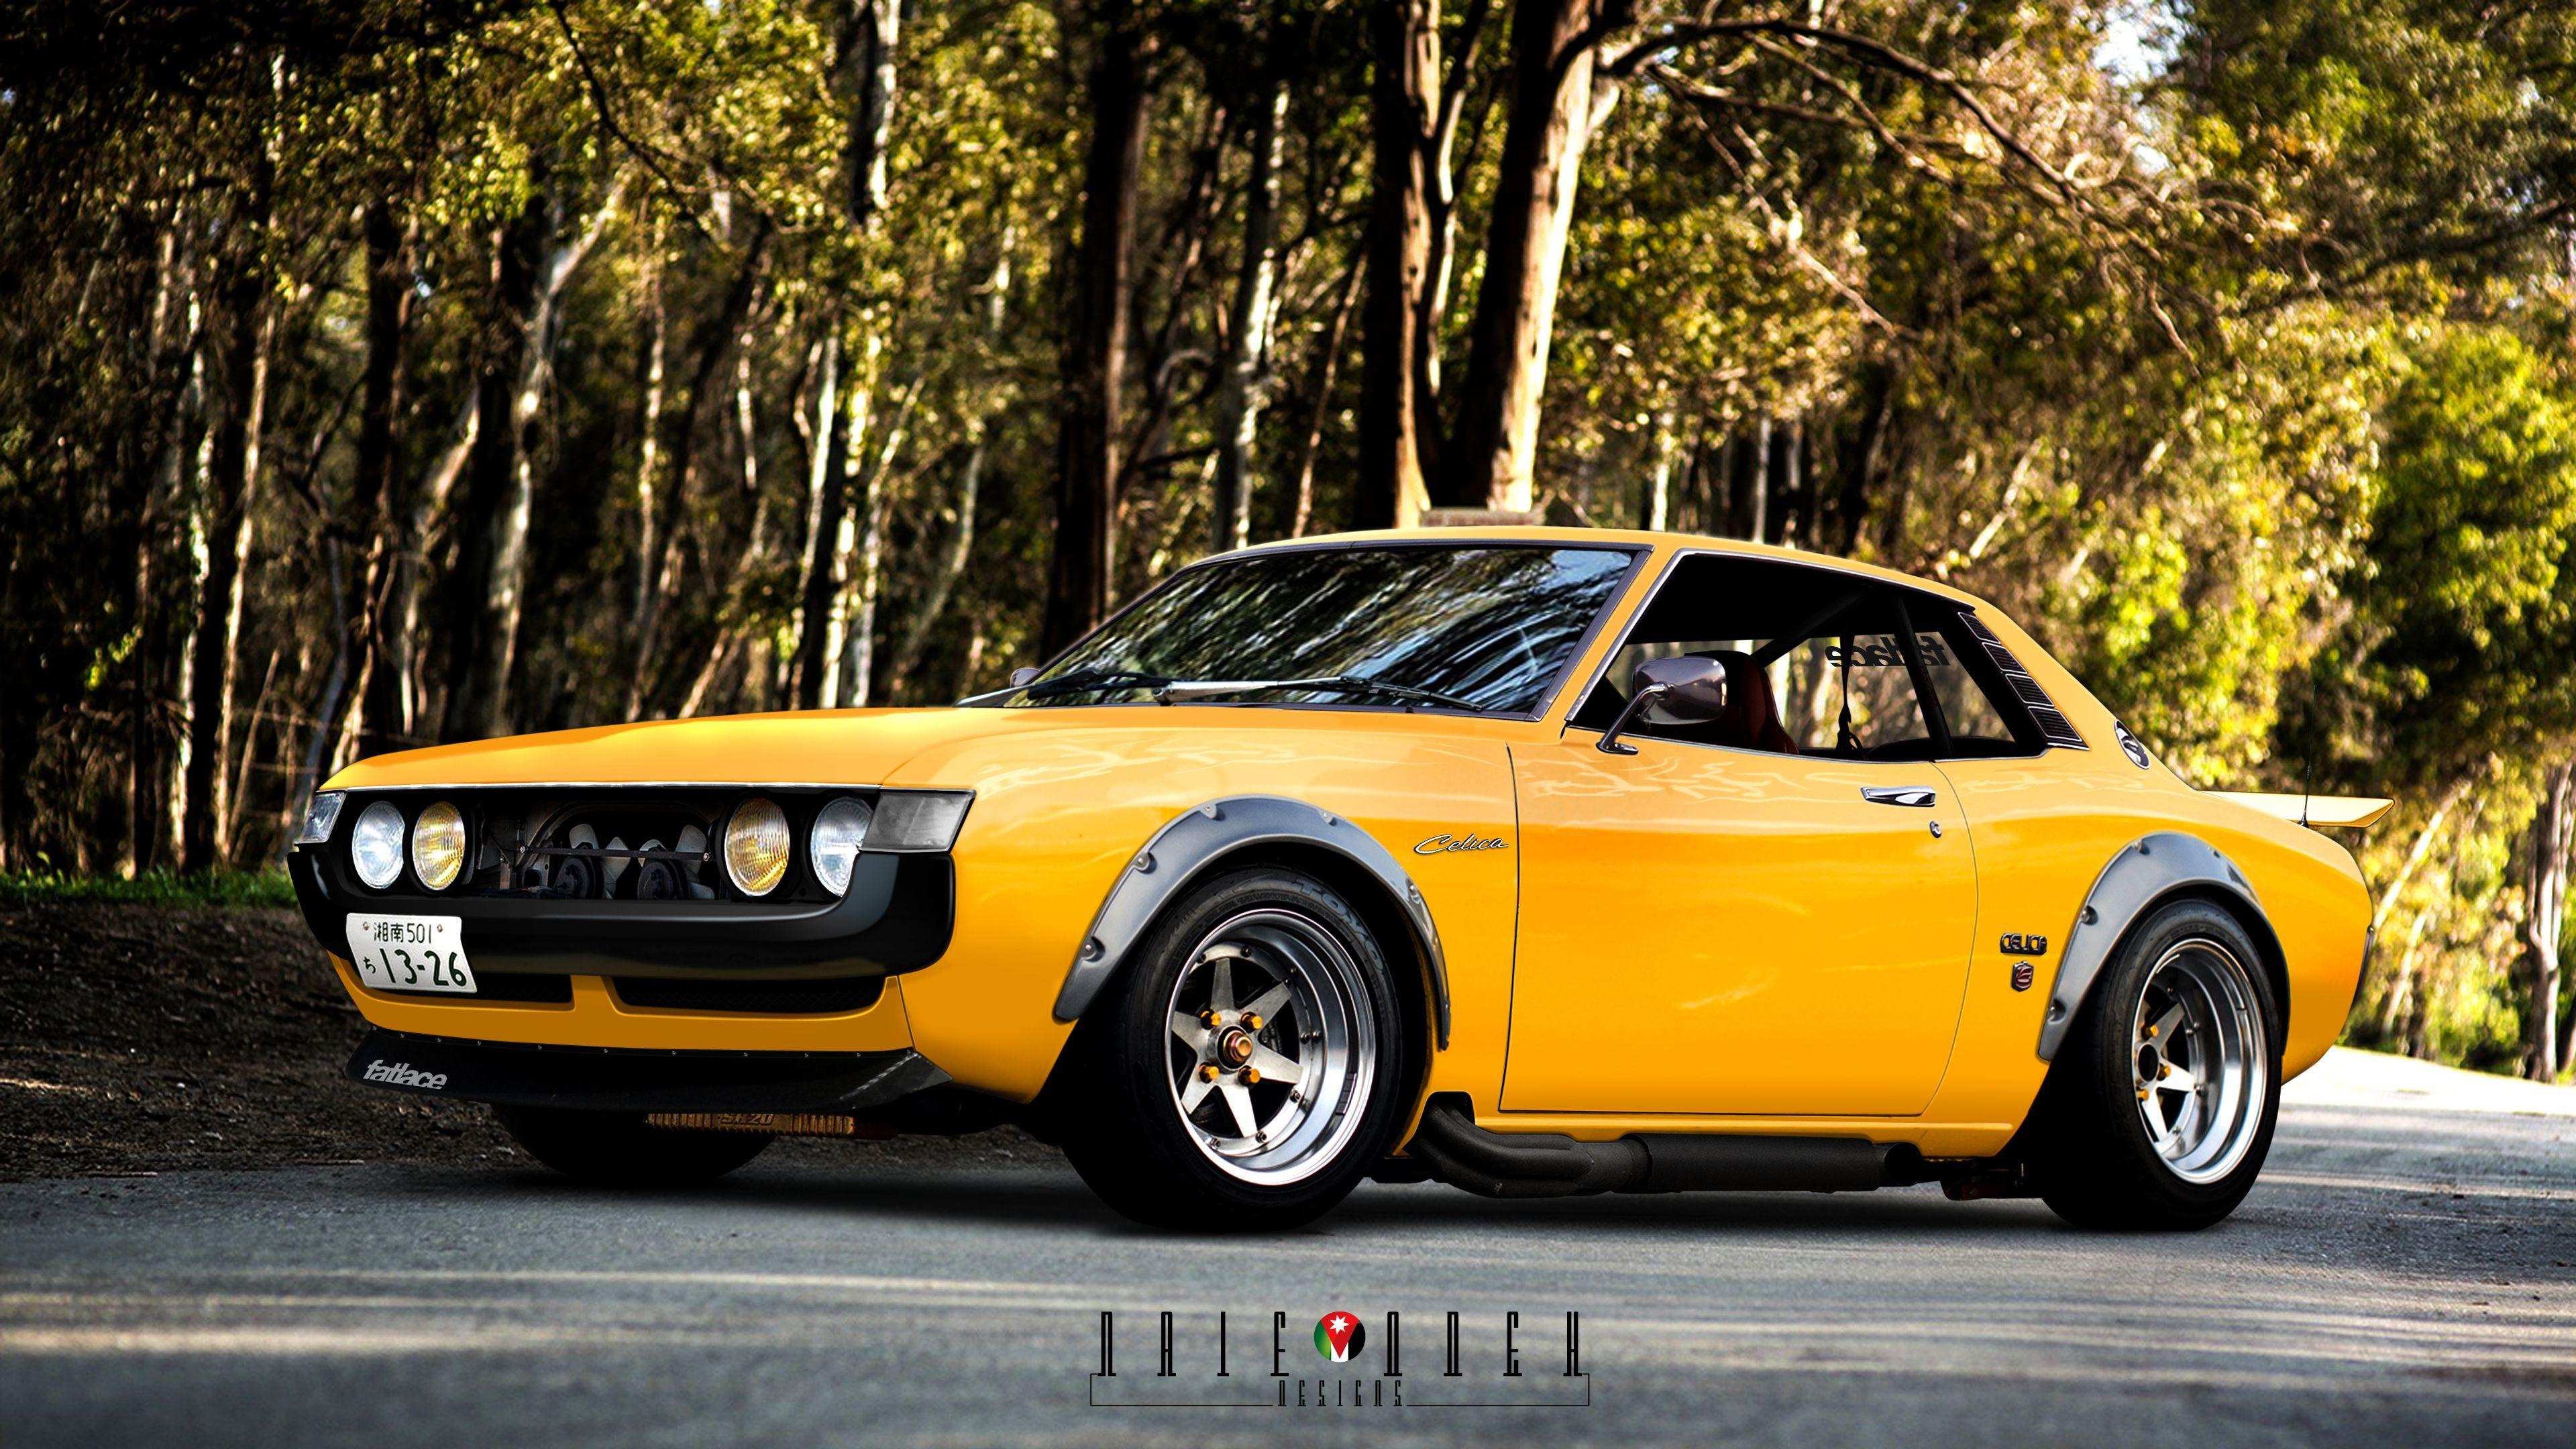 toyota celica te22 v2 nod designs by naifodeh classicford classic cars toyota celica classic japanese cars pinterest